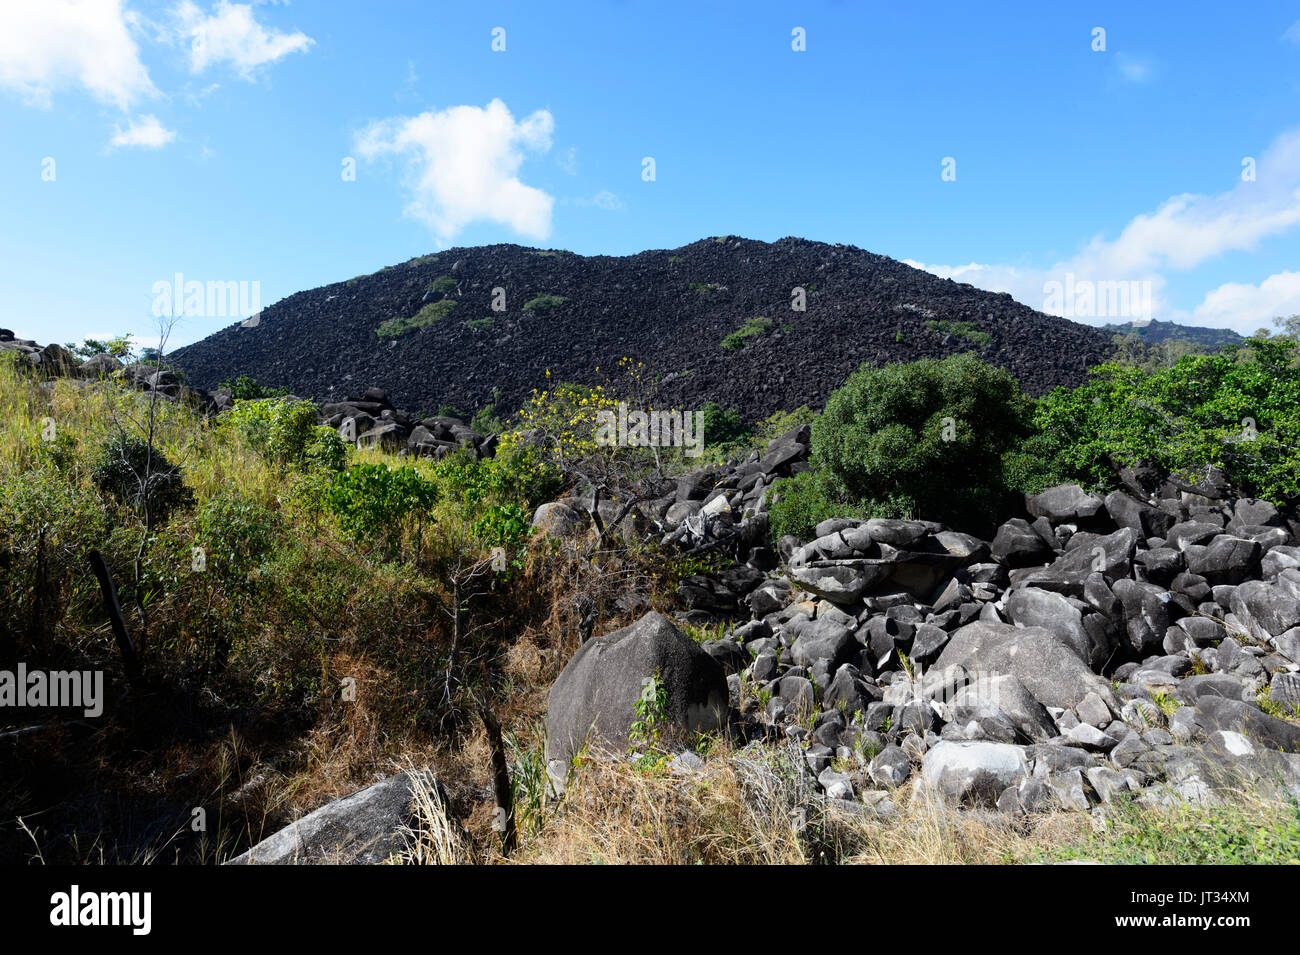 Granite boulders blackened by blue-green algae, Black Mountain (Kalkajaka) National Park, near Cooktown, Far North Queensland, FNQ, QLD, Australia - Stock Image